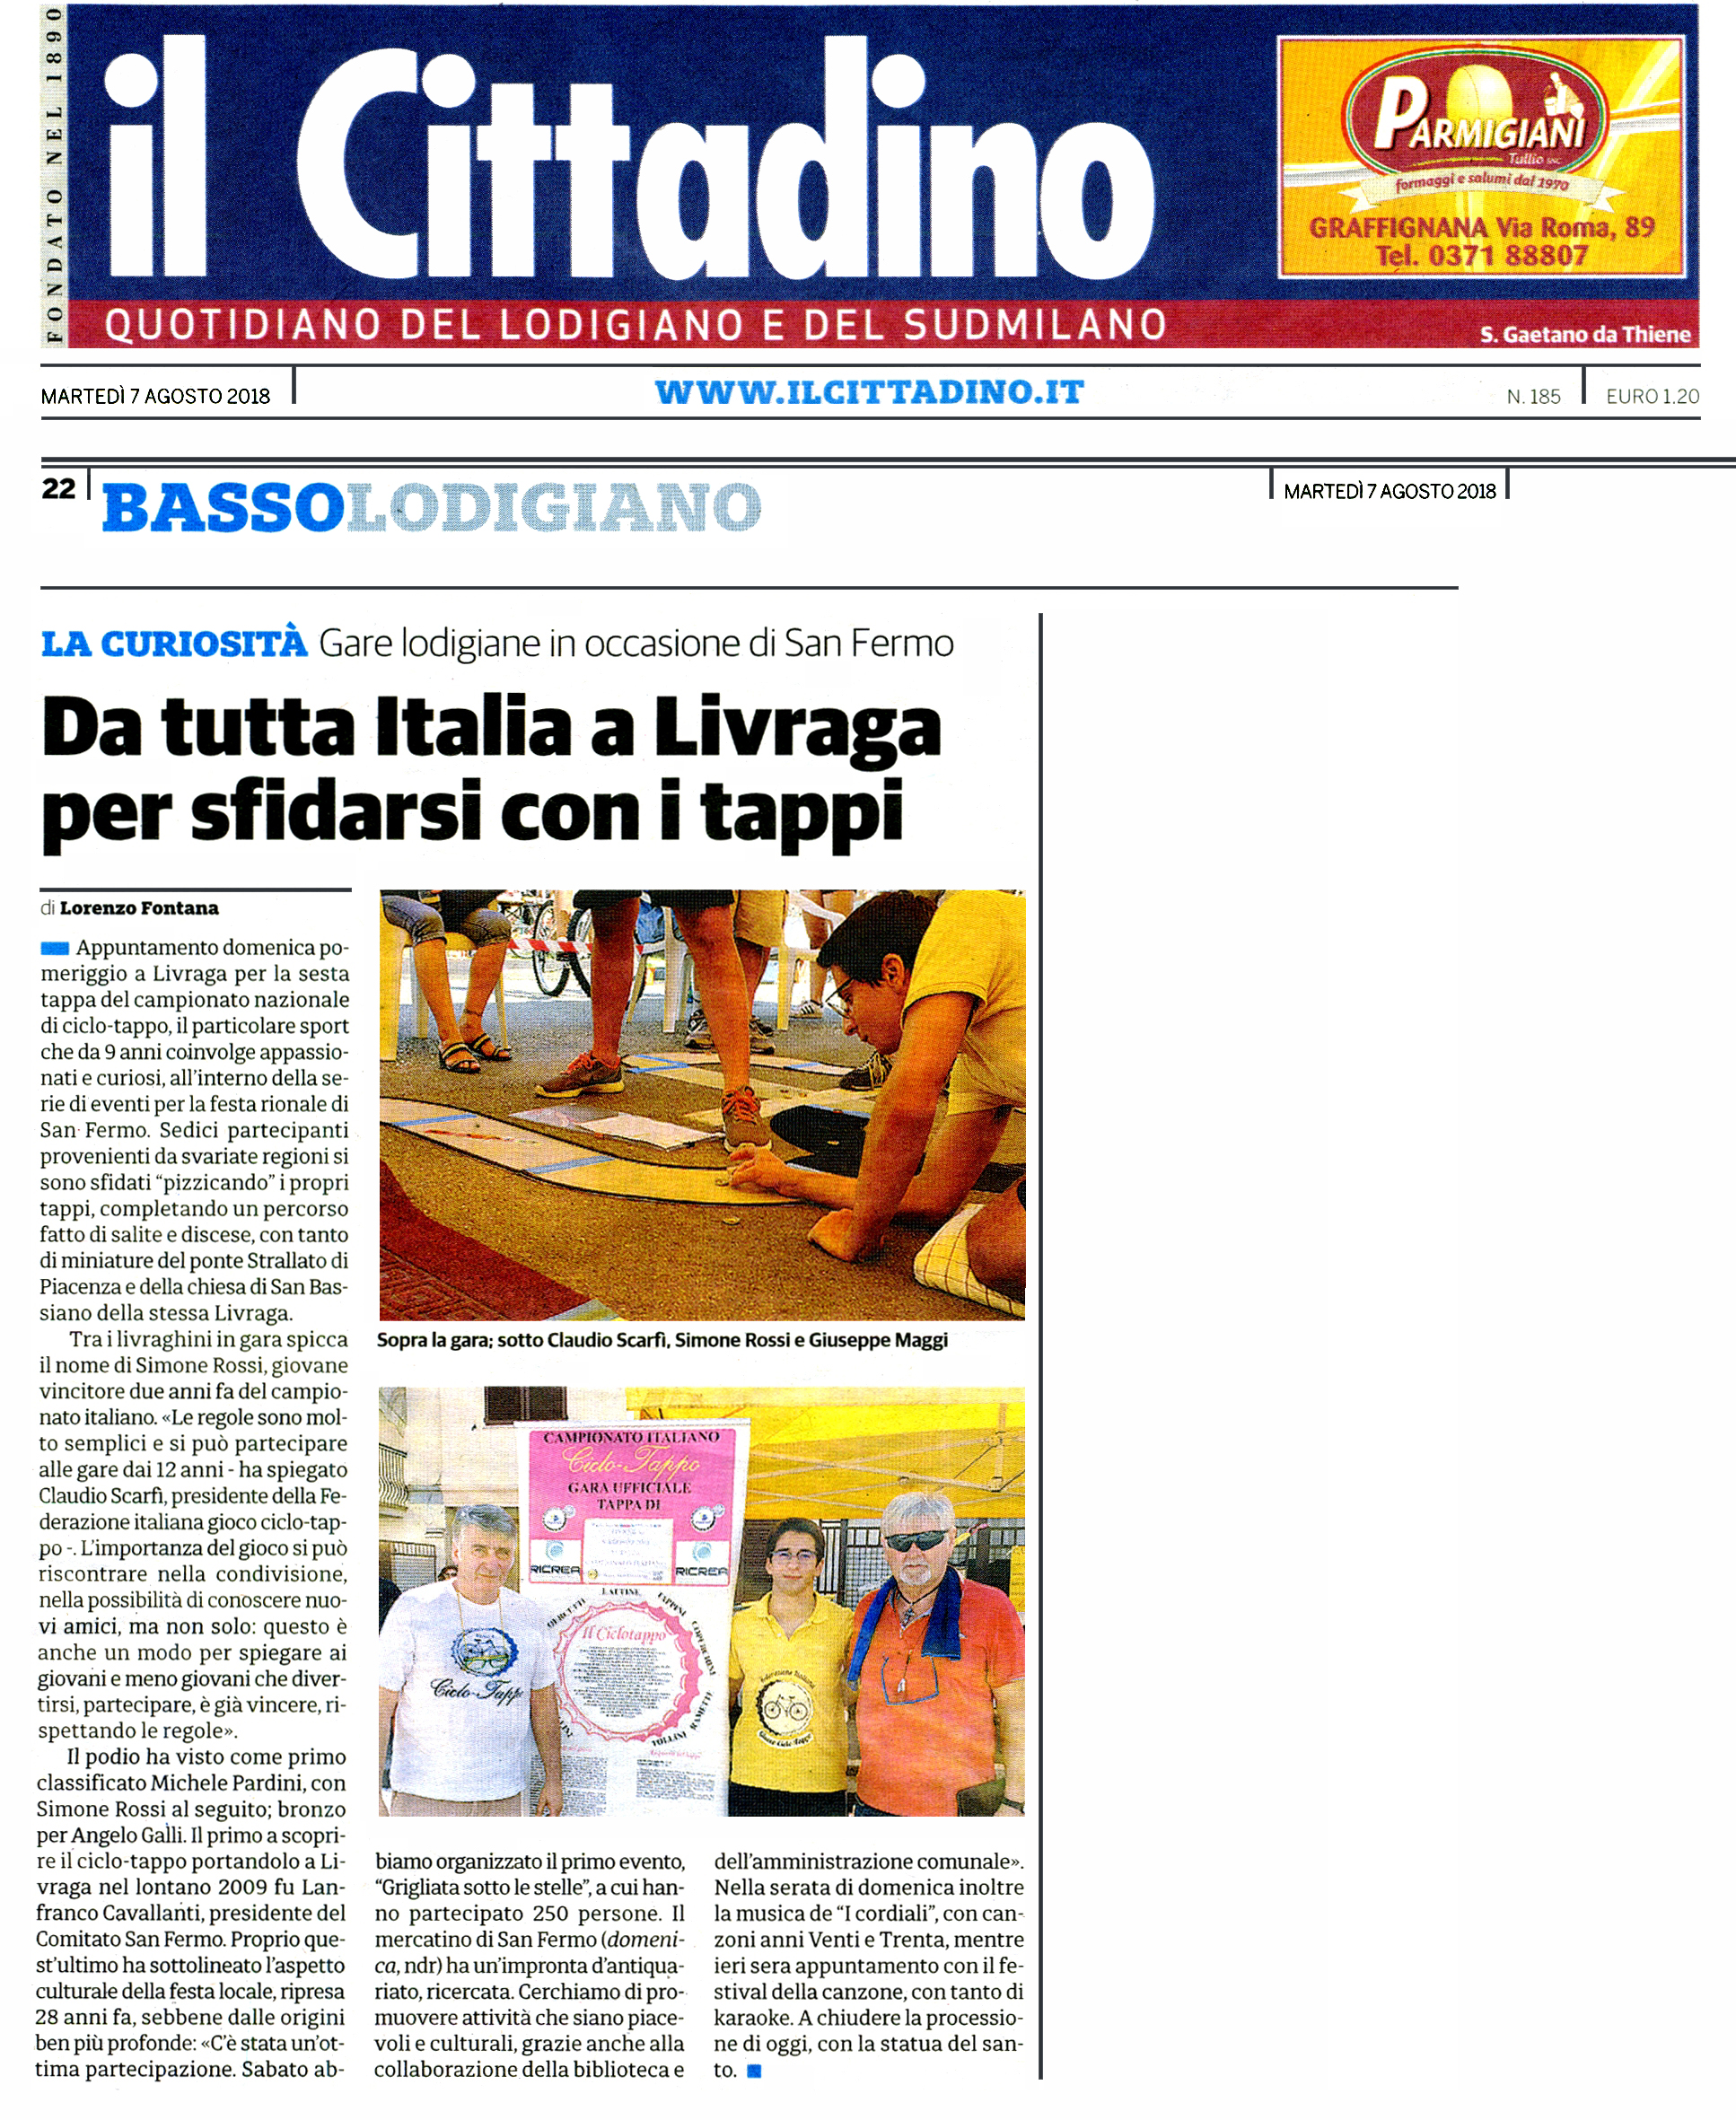 2018-08-07_Il Cittadino